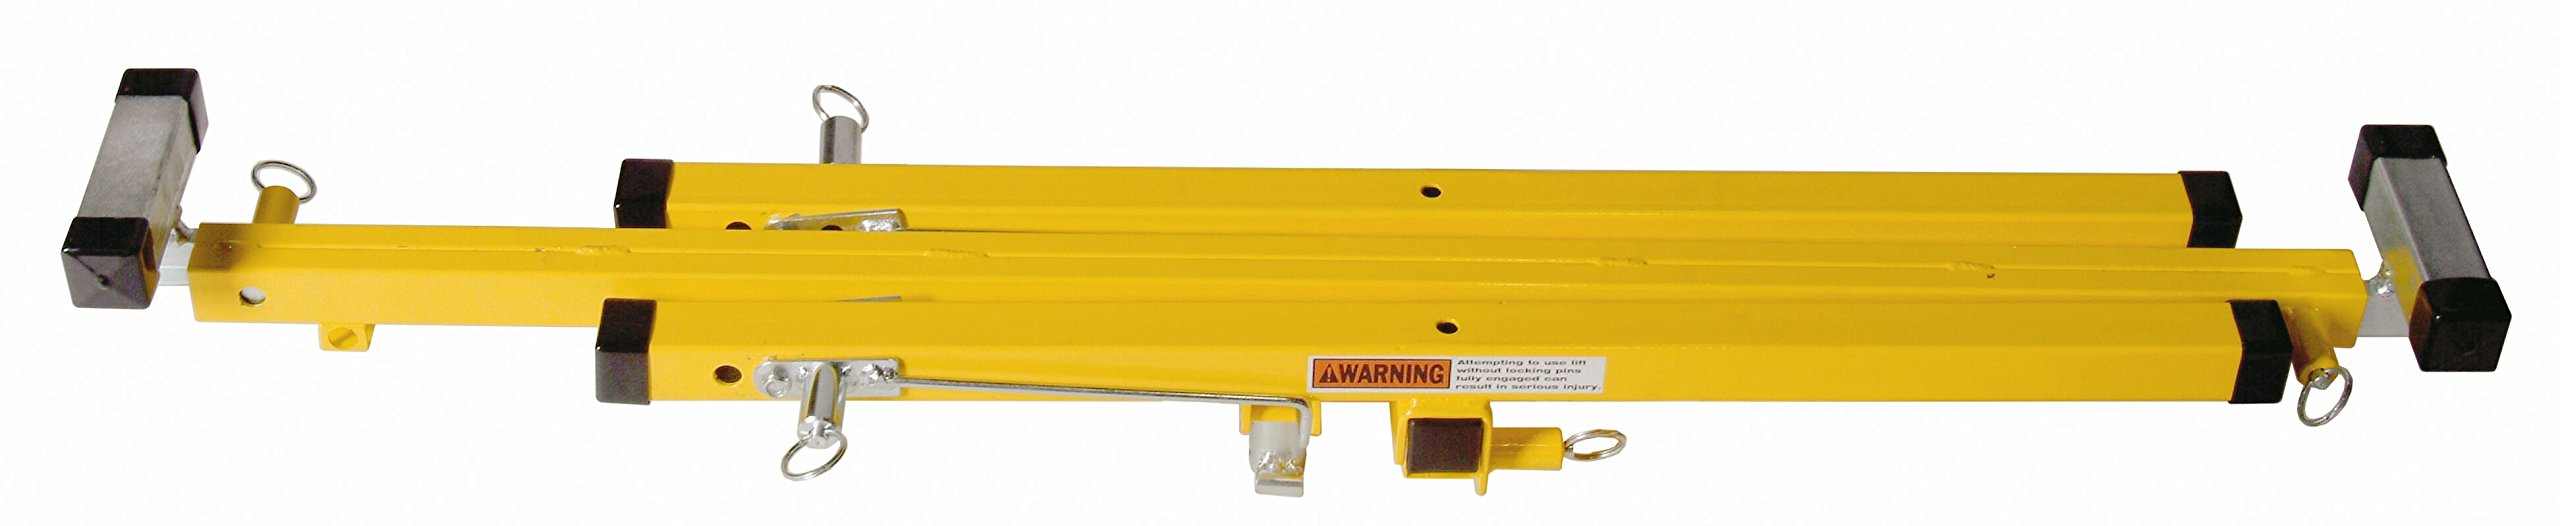 Sumner 784355 Drywall Cradle for Drywall Lift